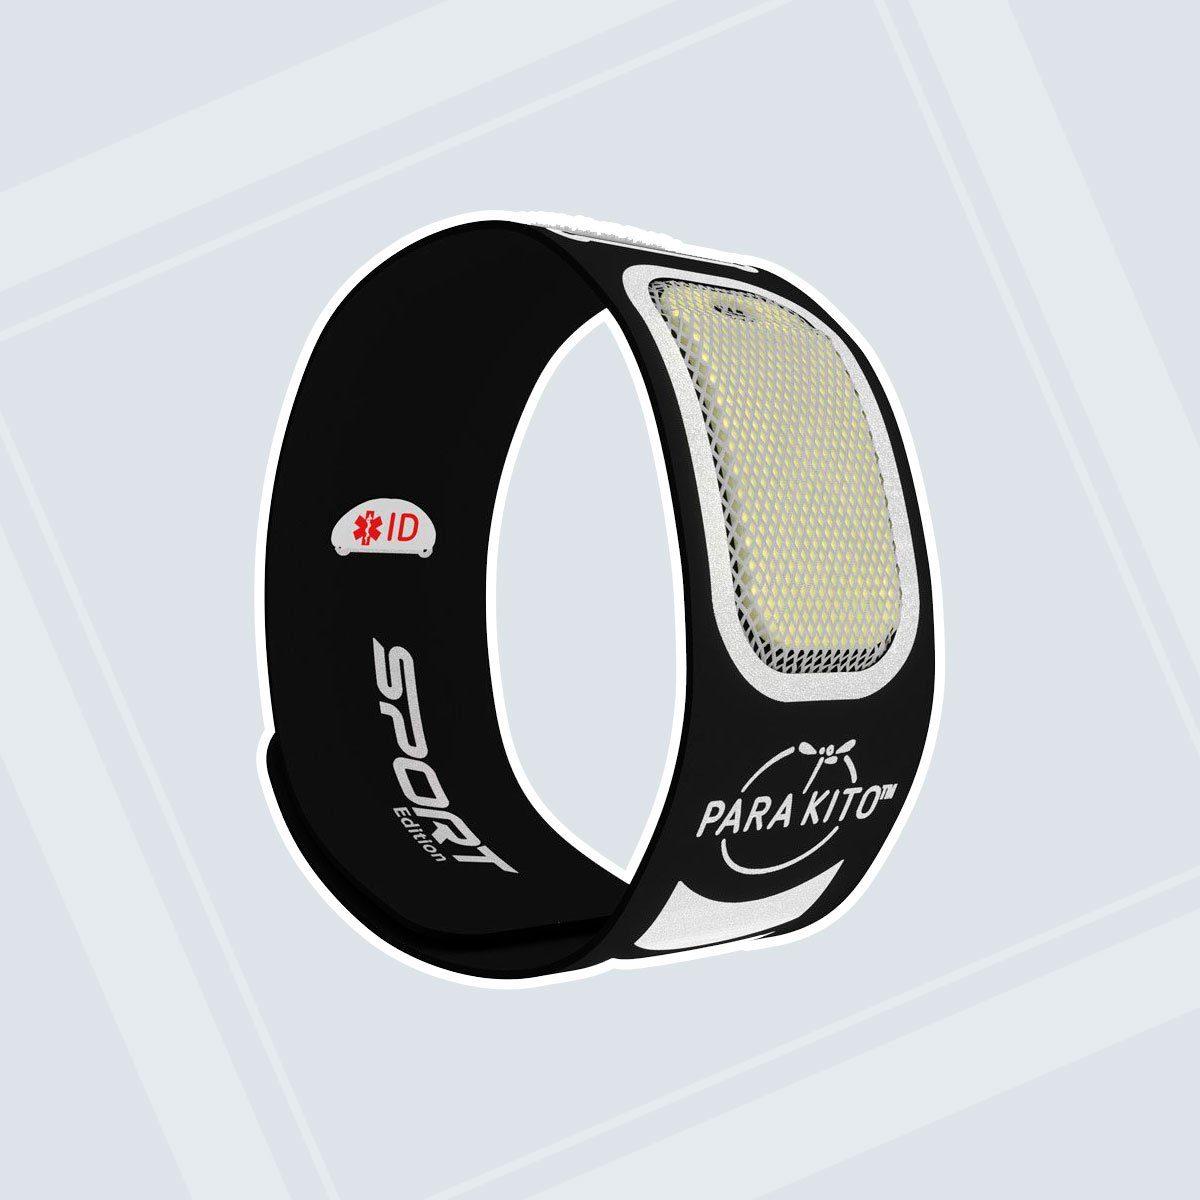 Mosquito Repellent Wristbands